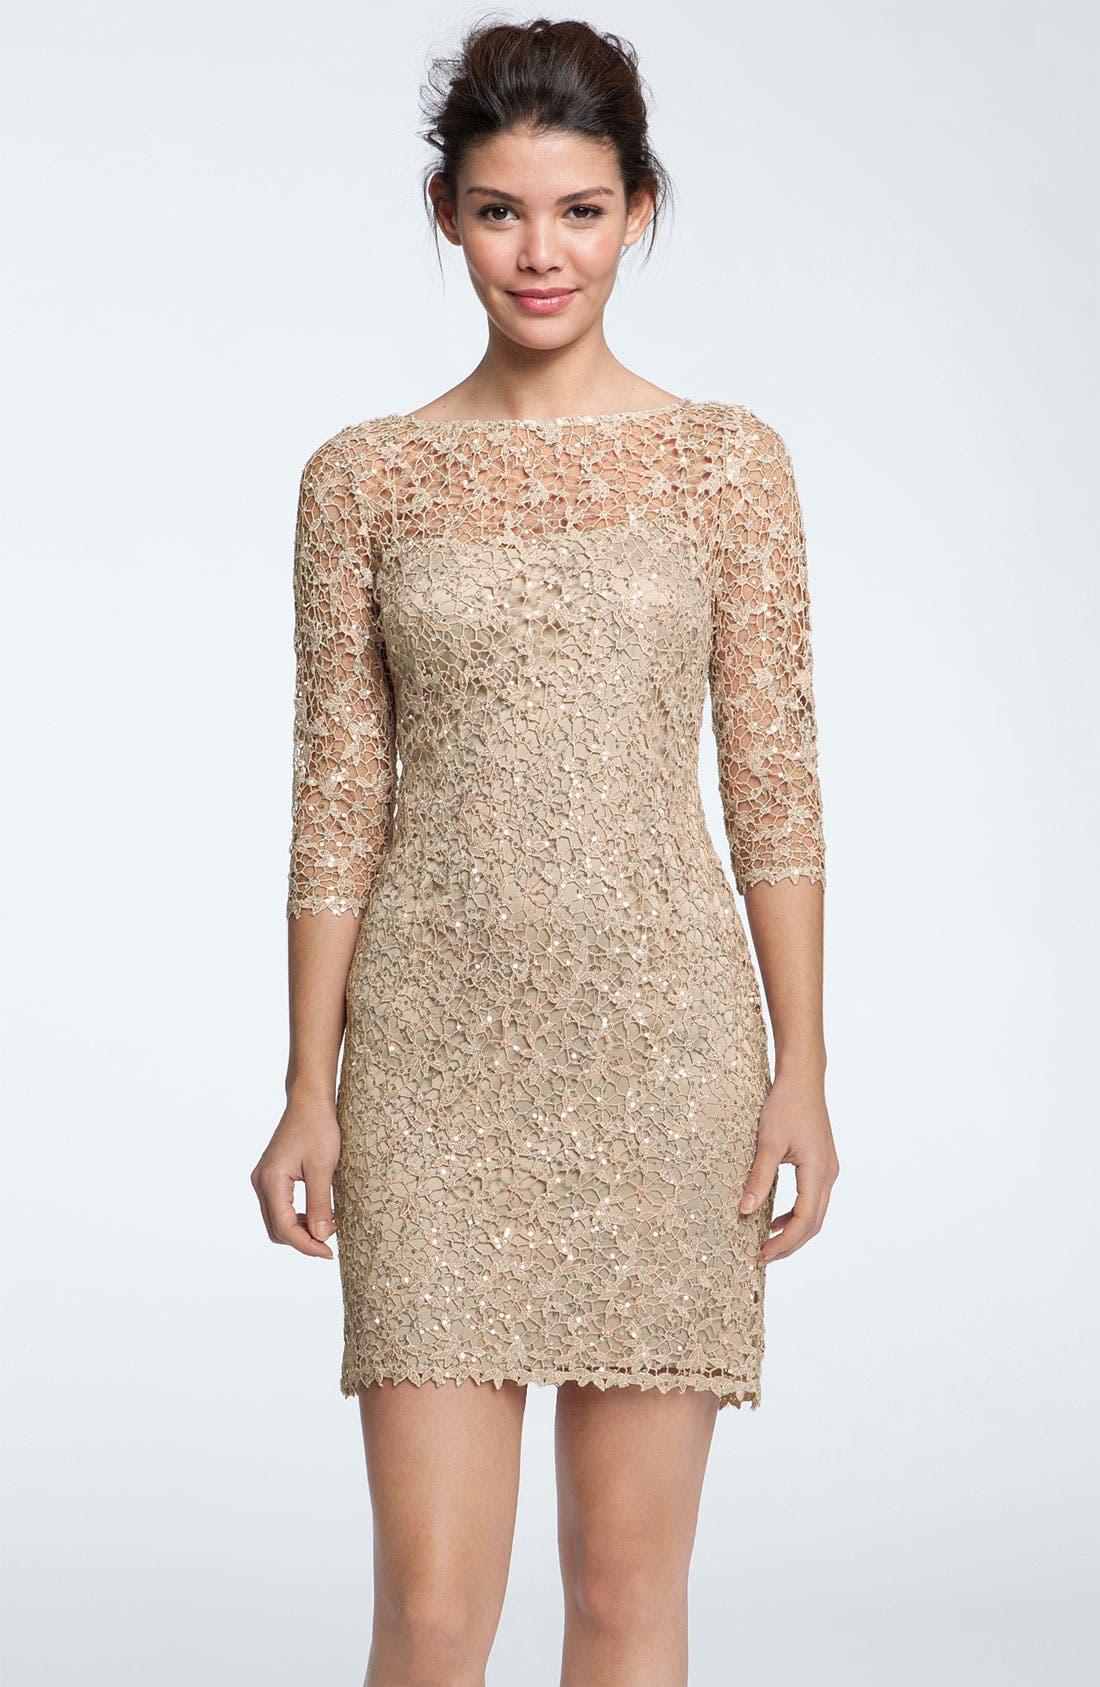 Alternate Image 1 Selected - Kay Unger Sequin & Lace Sheath Dress (Petite)